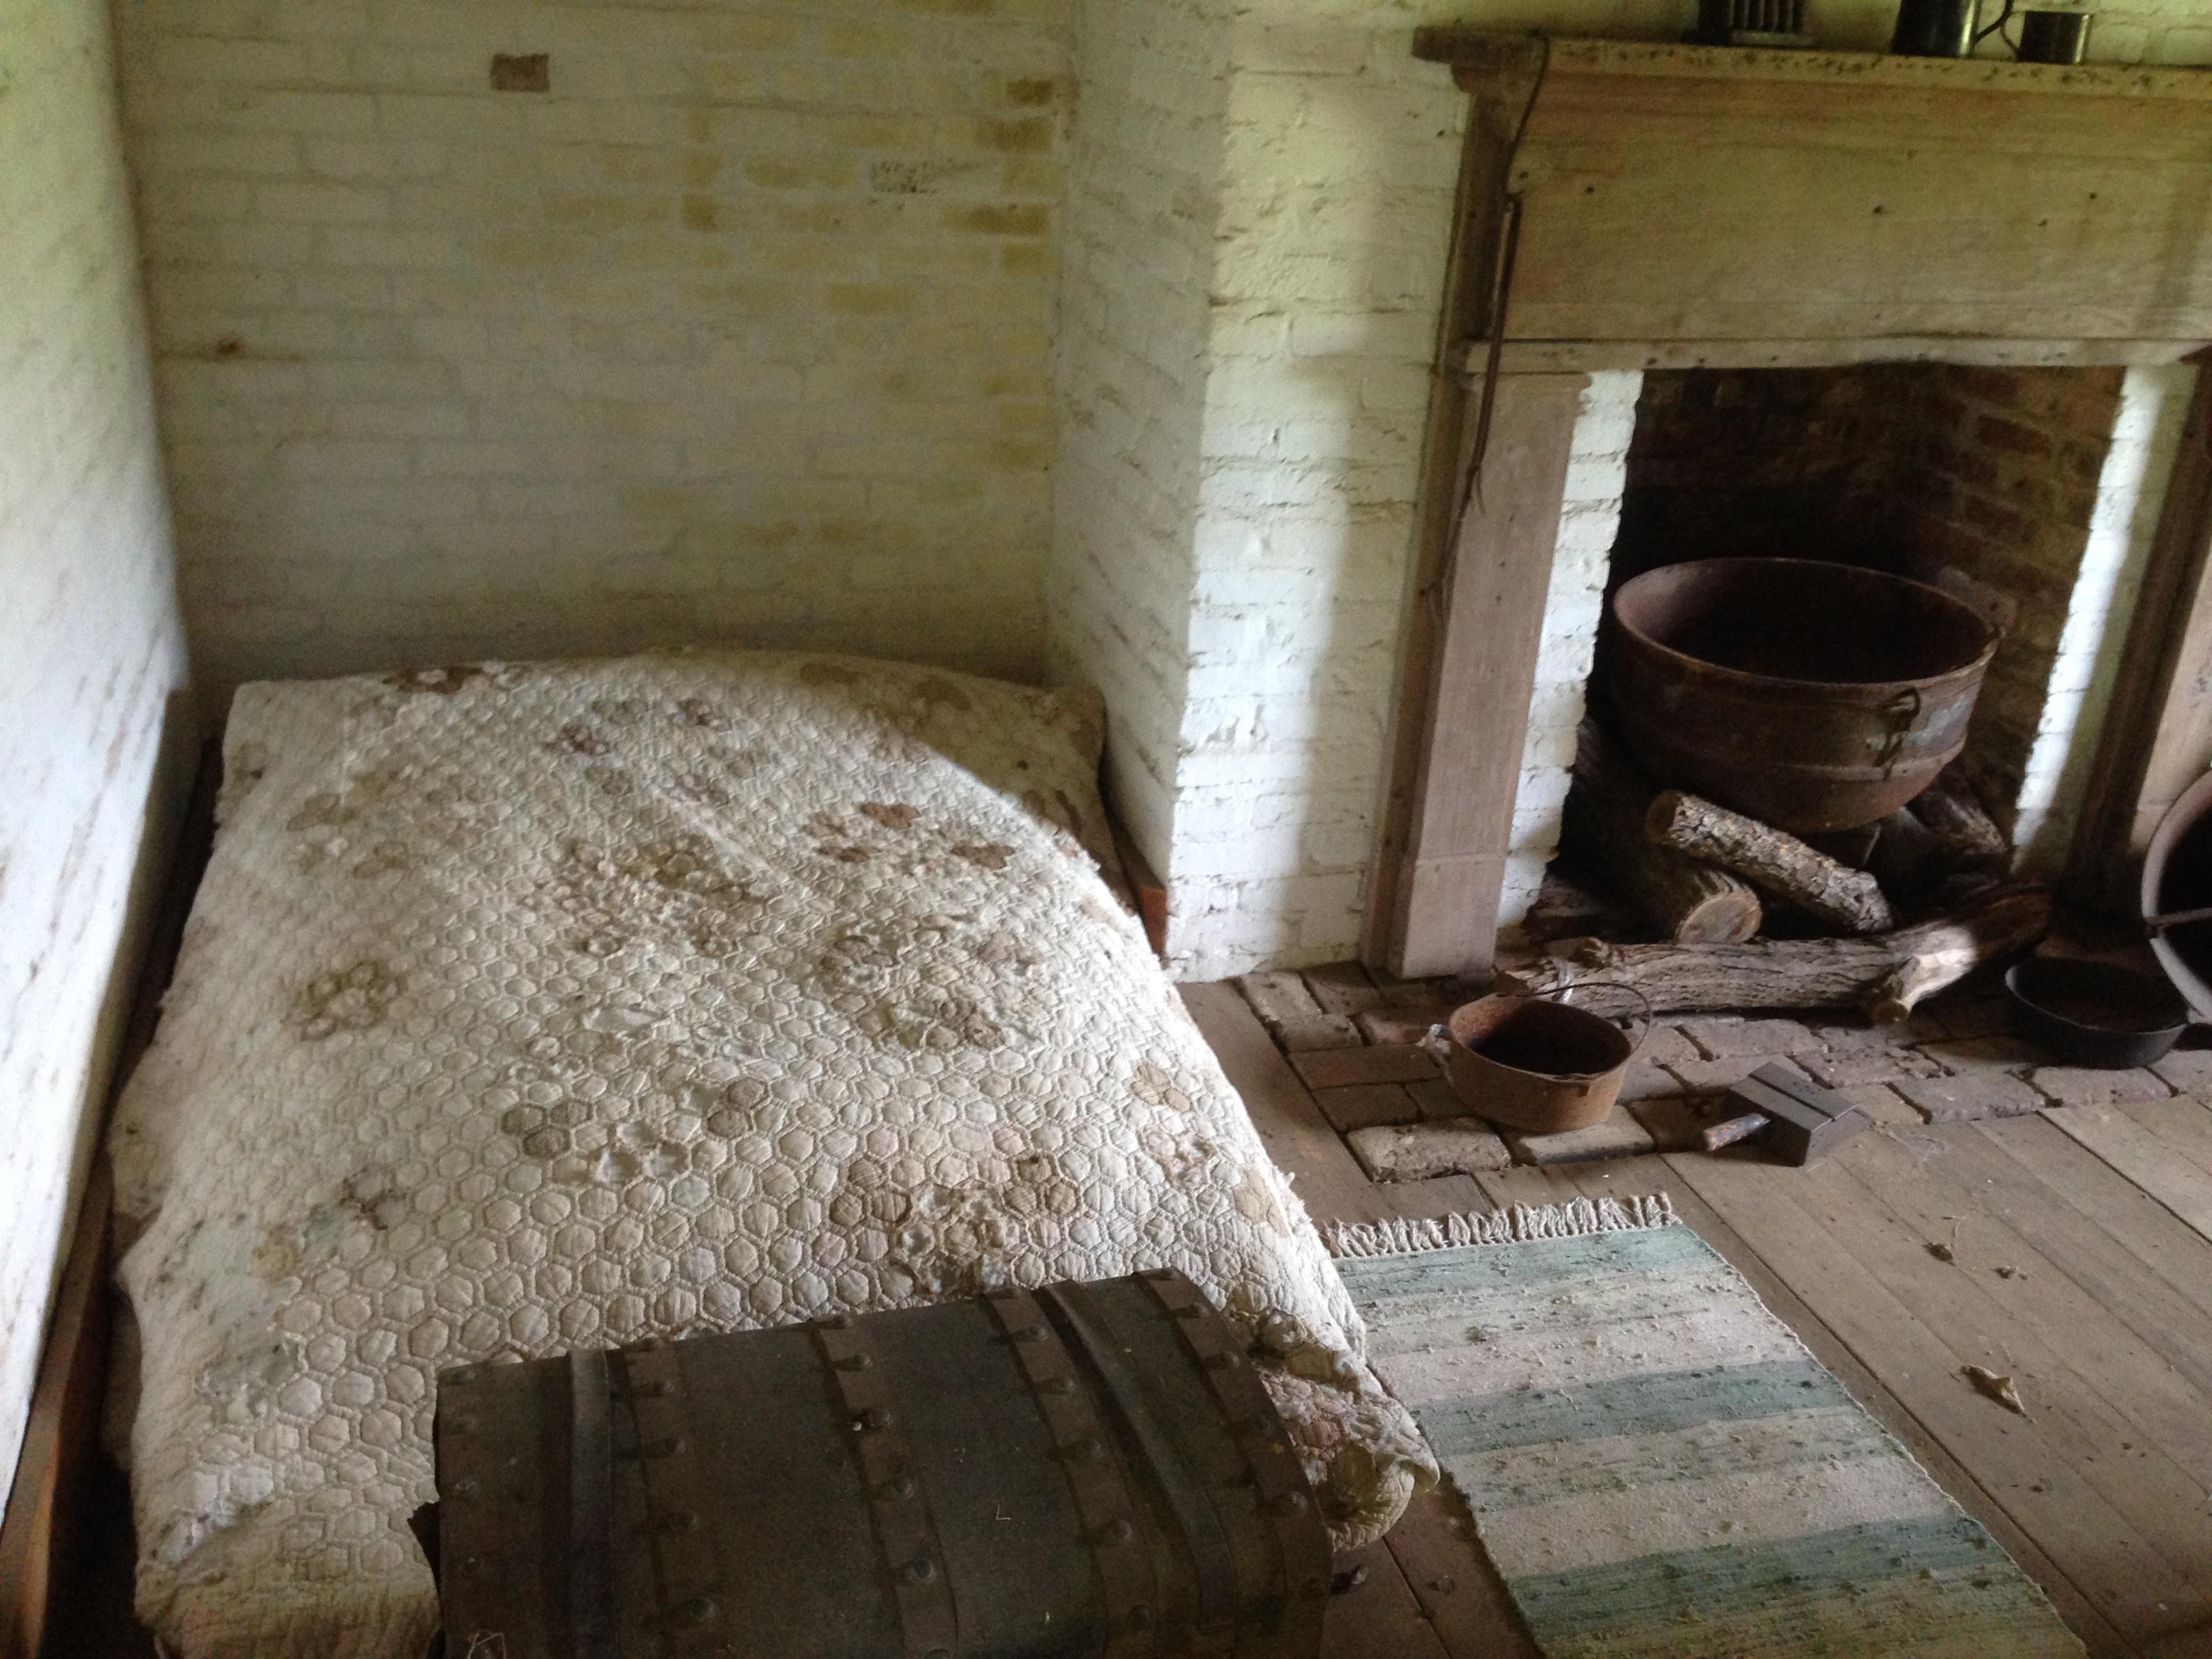 One Bedroom Cabins In Gatlinburg Civil War Sights Near Nashville The Independent Tourist